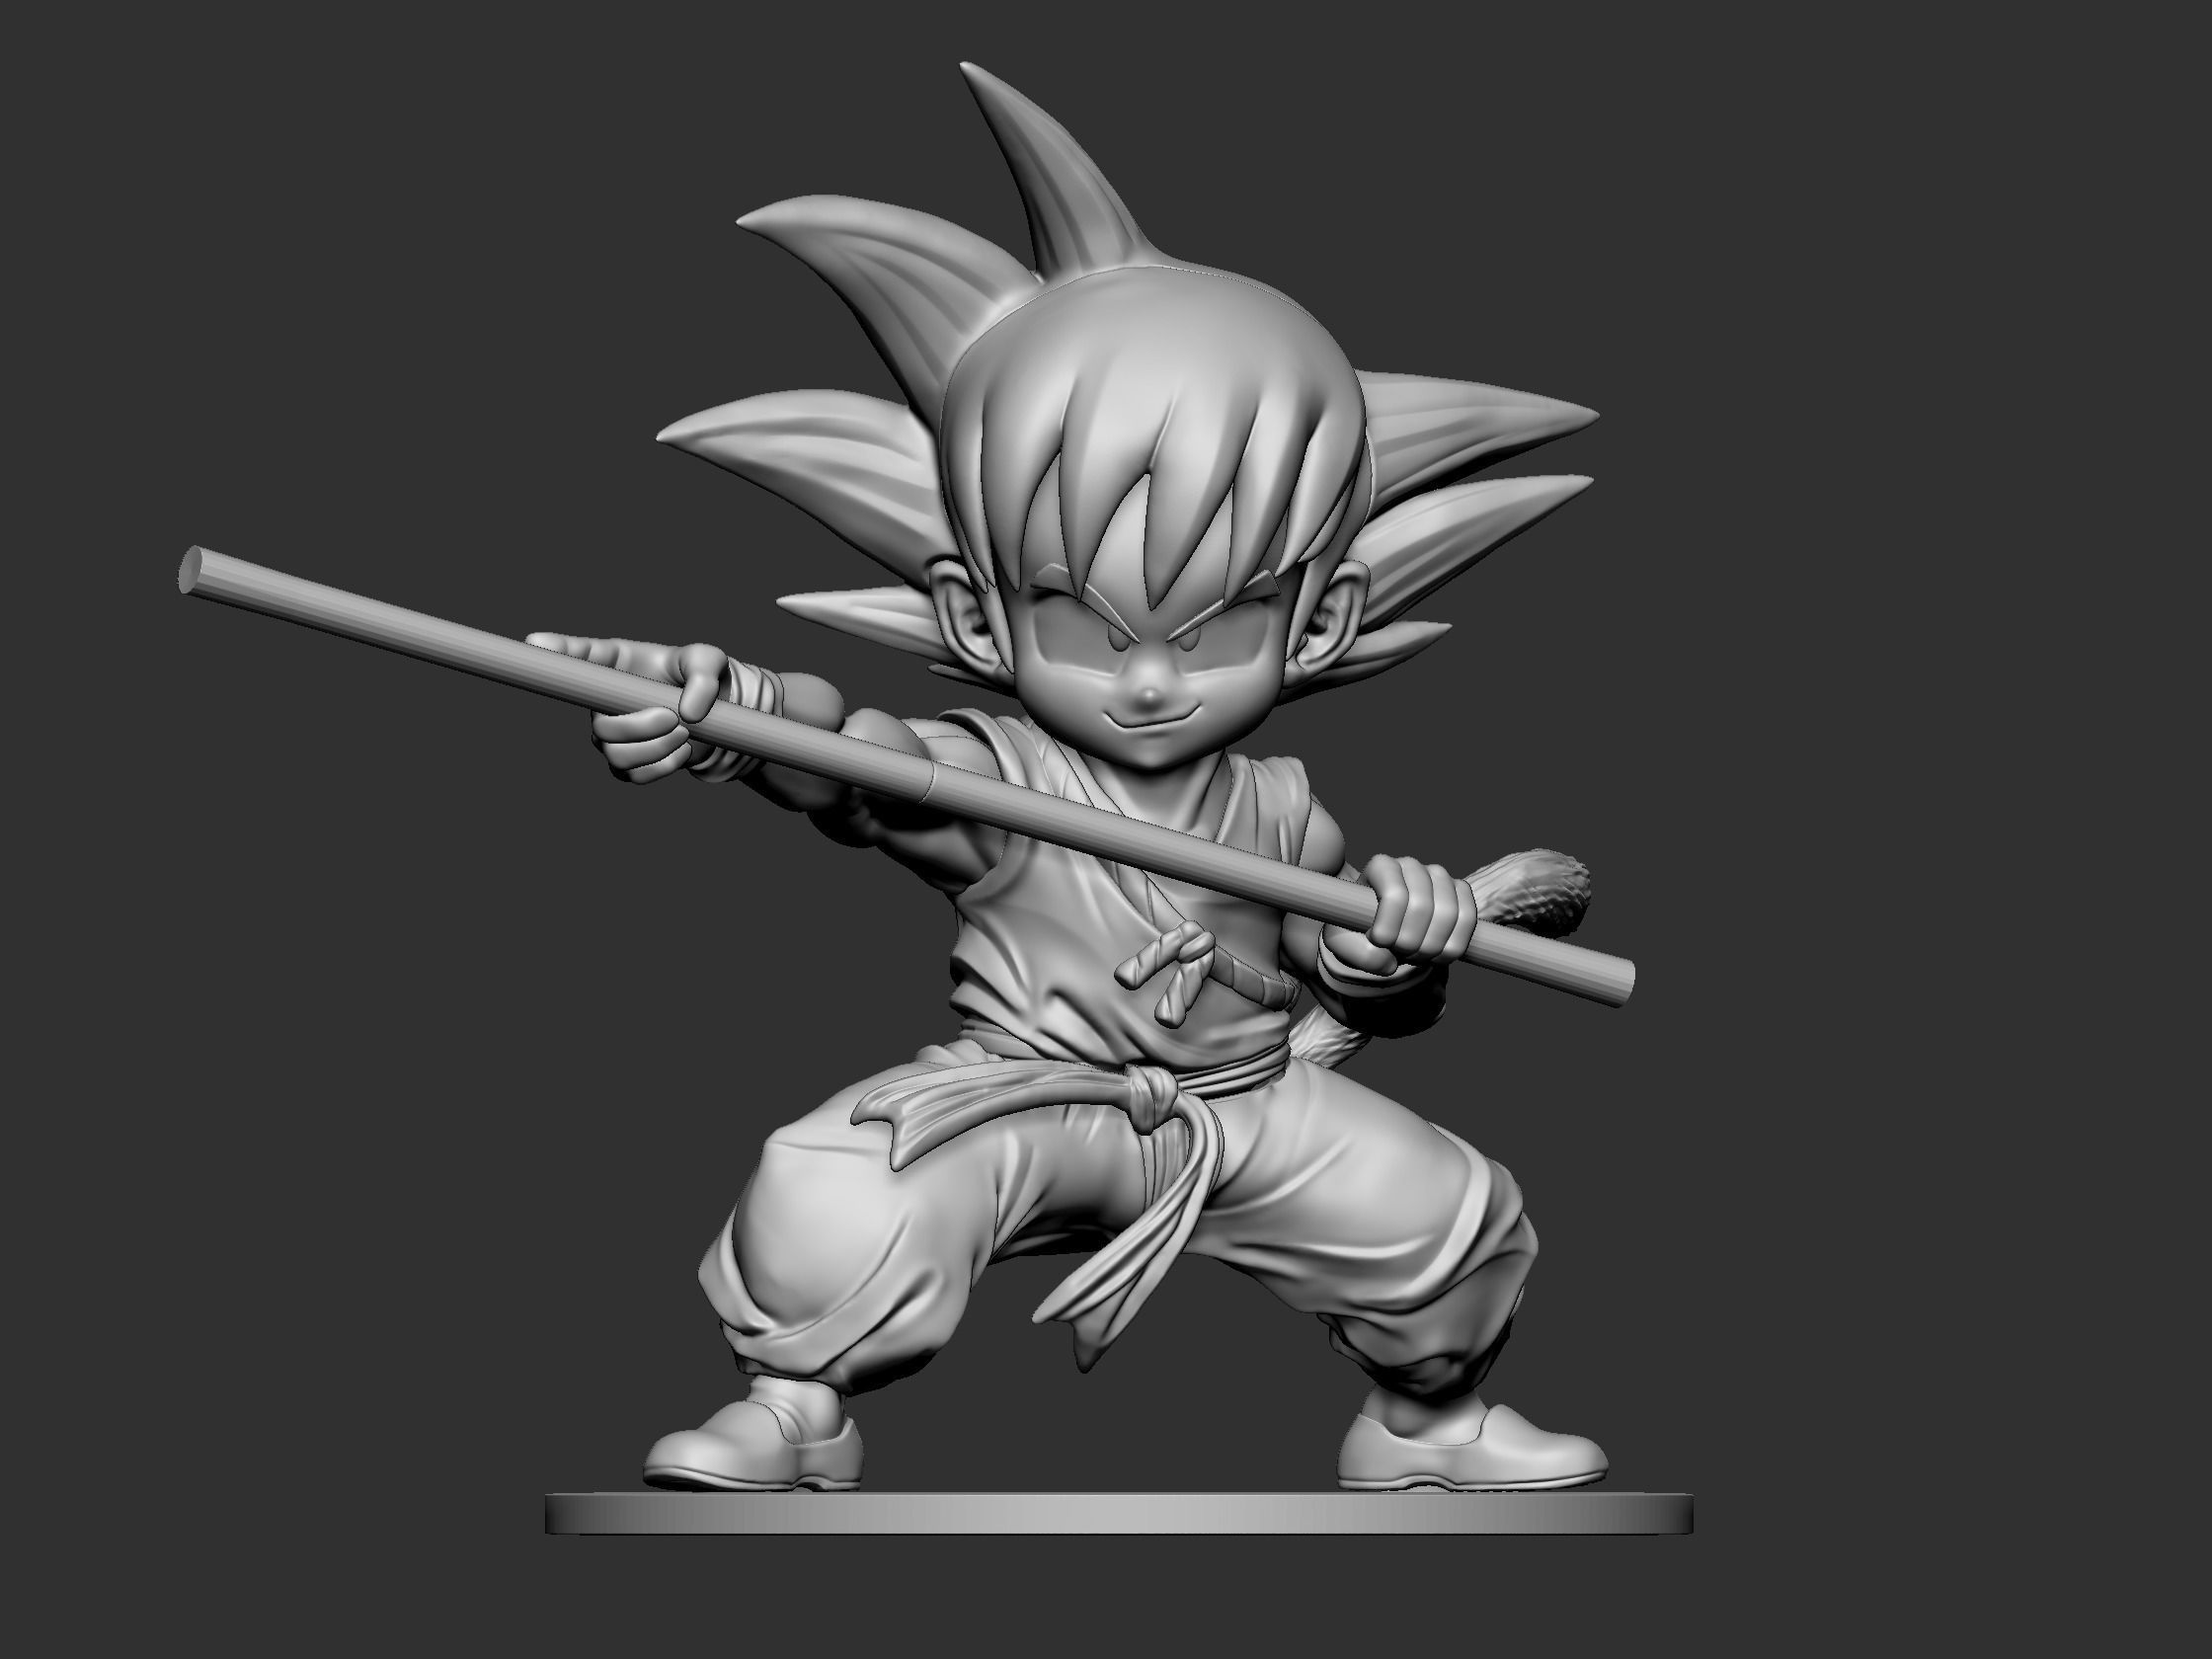 Child Go-Ku Fan Art for 3DPrint